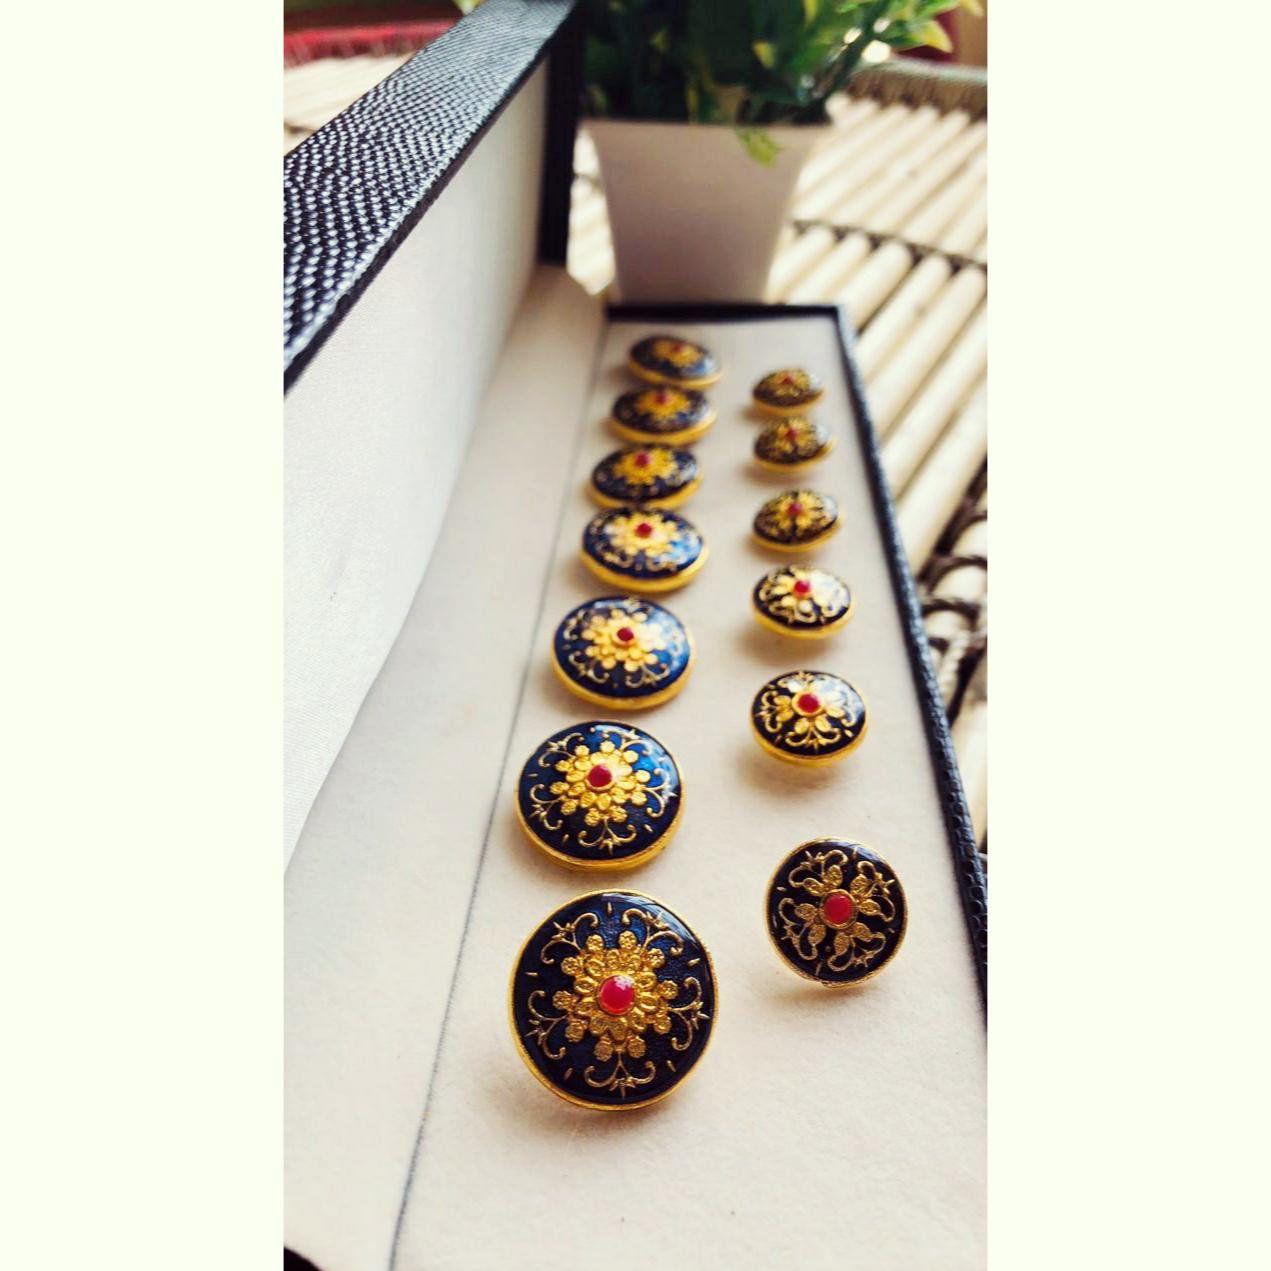 Handmade traditional Rajasthani Enameled Button